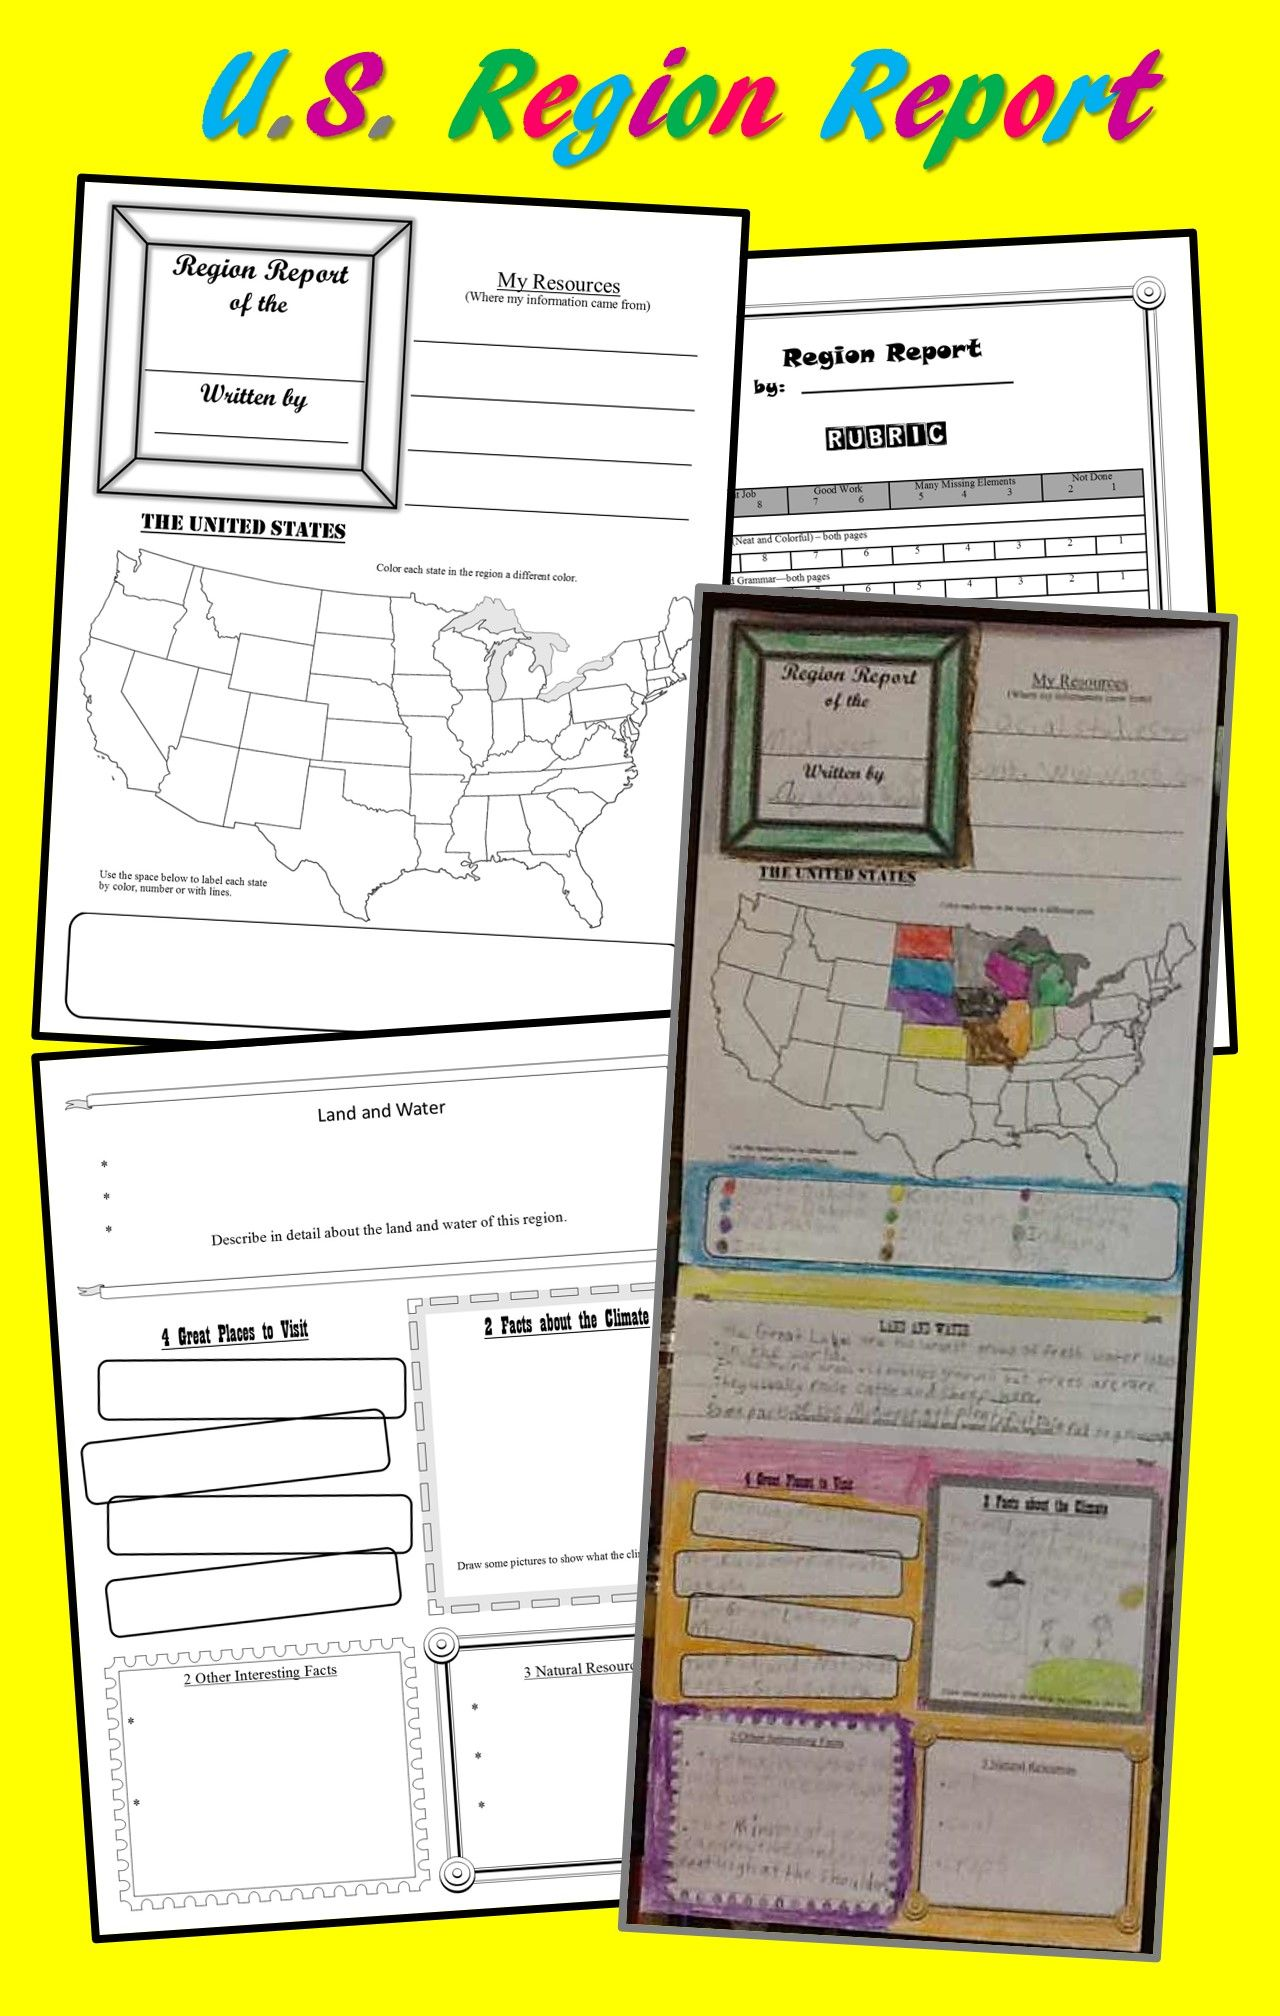 medium resolution of U.S. Region Report (Poster) Template for Intermediate Grades   Homeschool social  studies